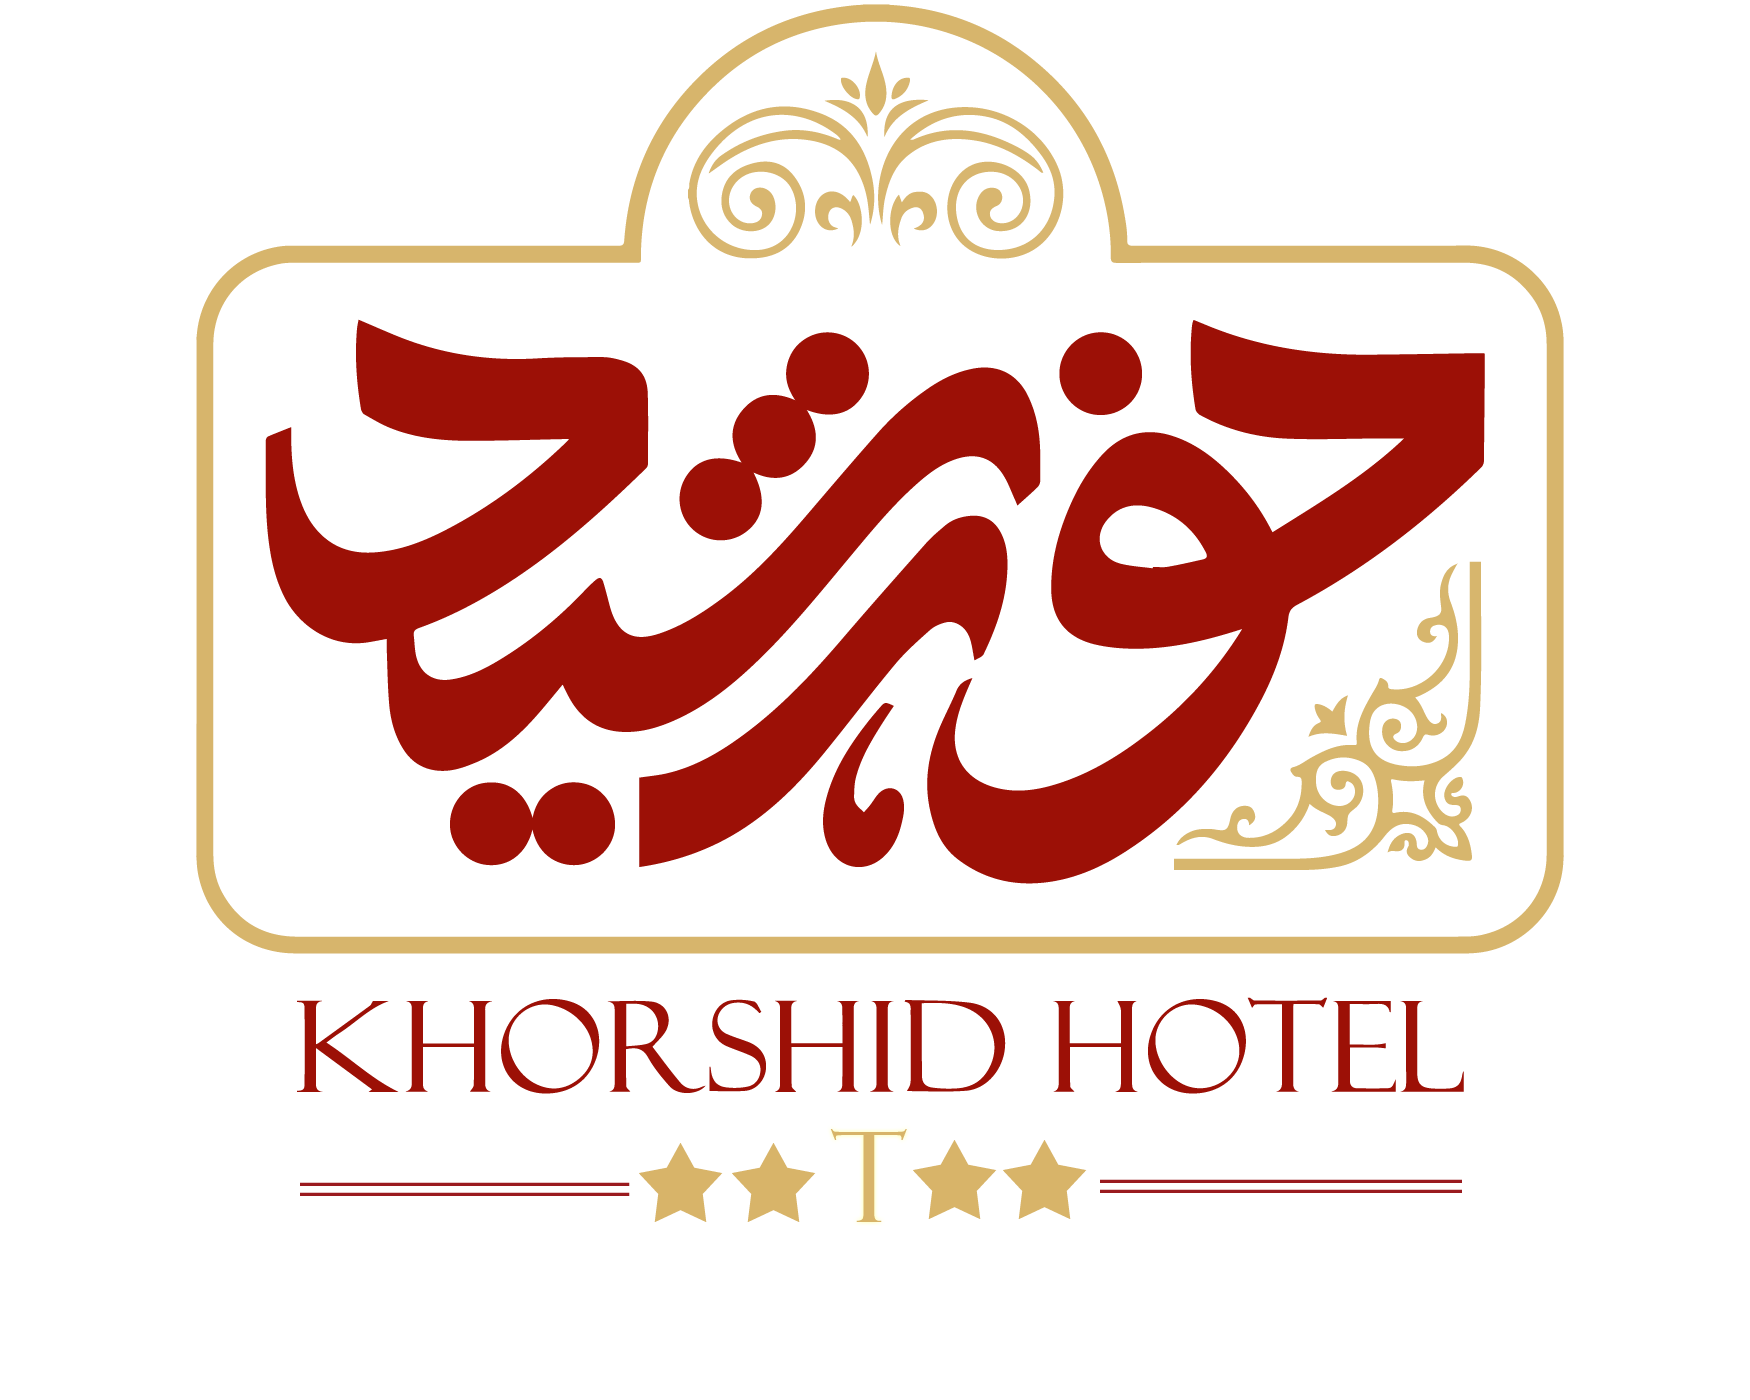 هتل خورشيد قم